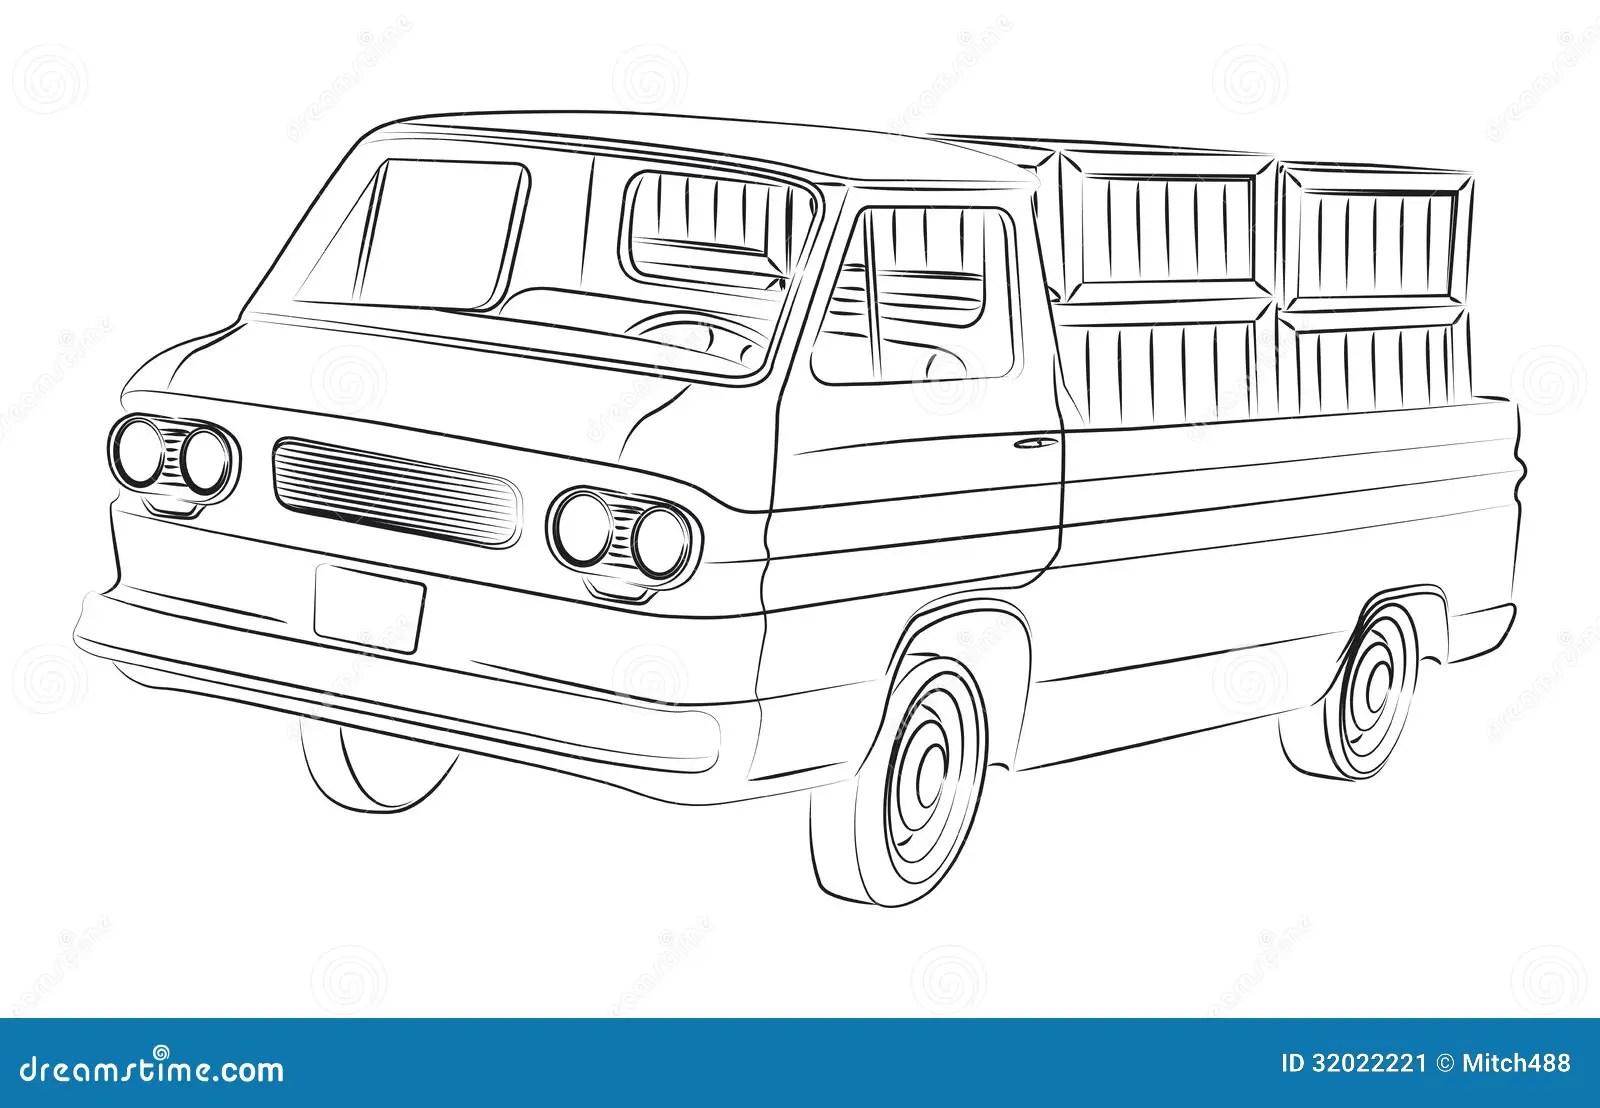 Old Pickup Drawing Stock Image